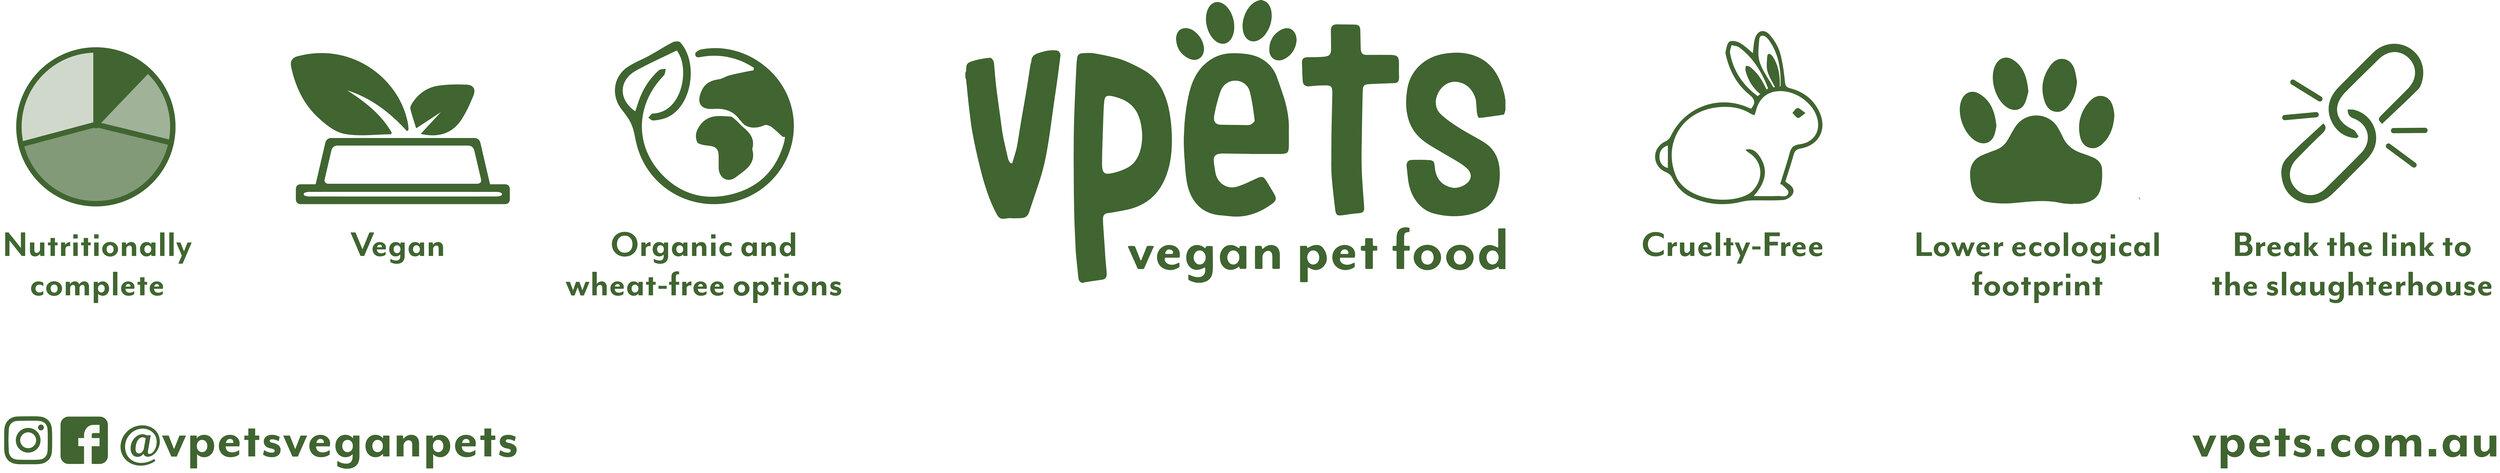 V Pets banner.jpg